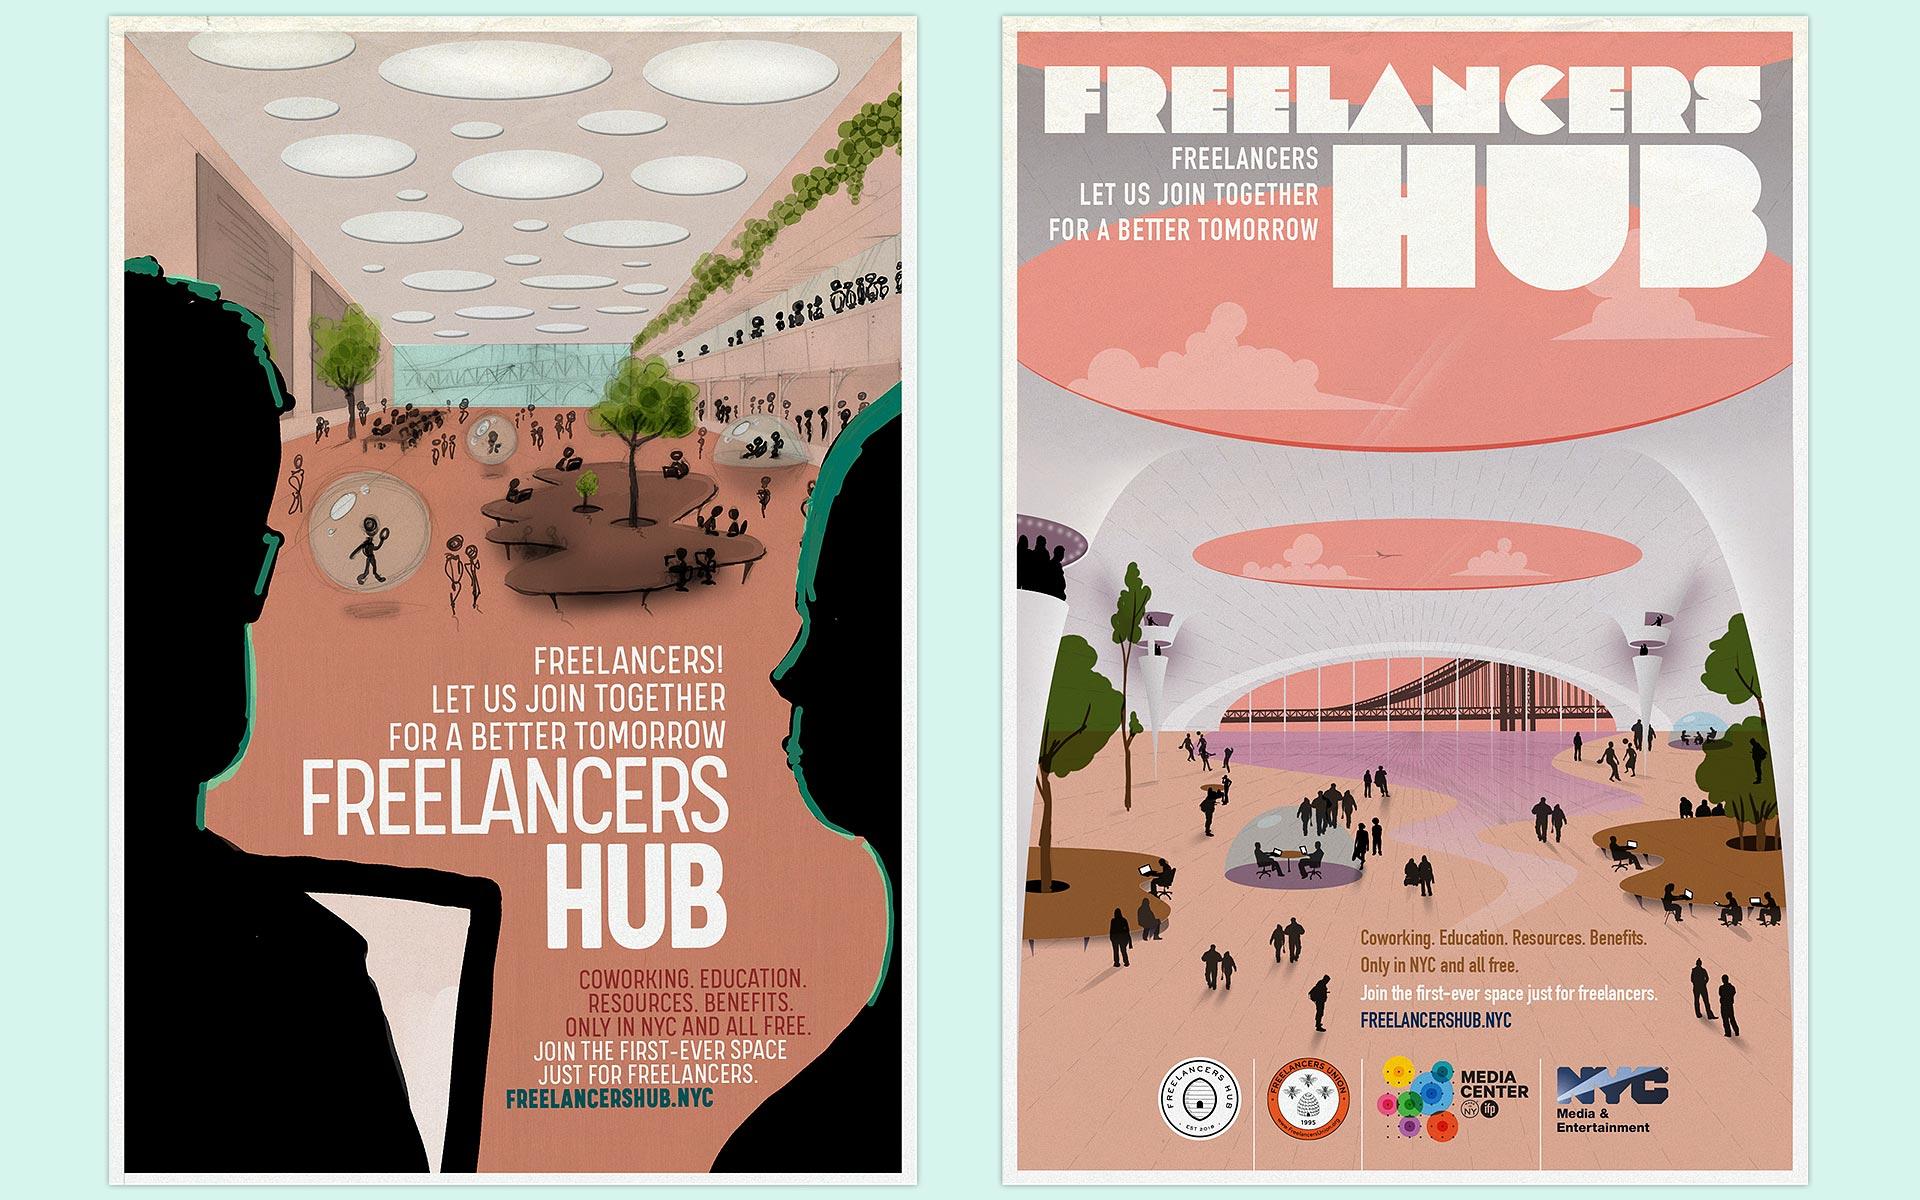 freelancers-hub-comps@2x.jpg